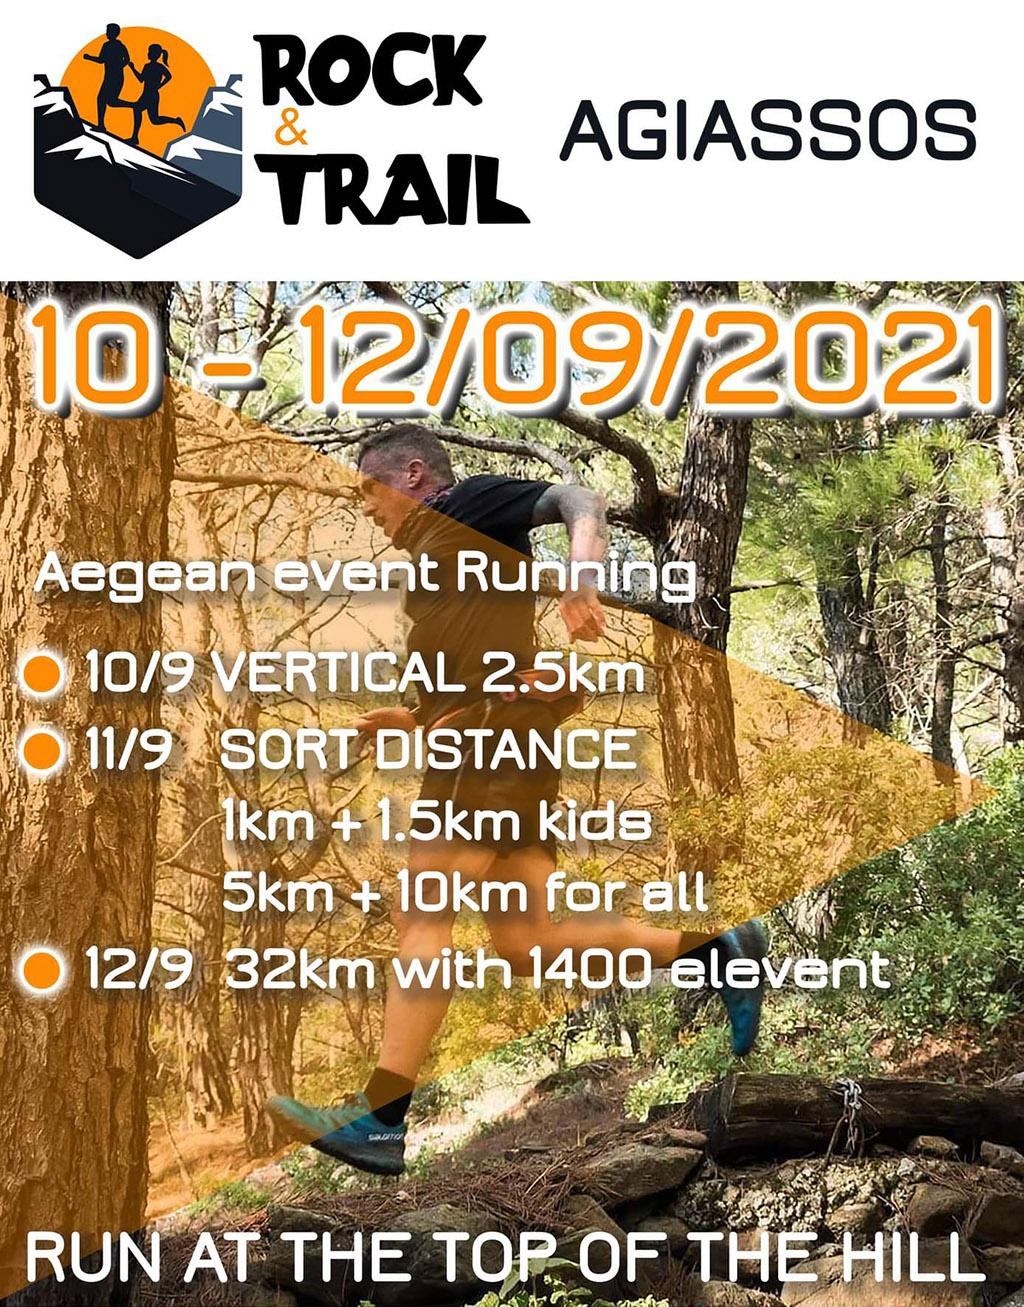 Rock & Trail Agiassos Ορεινός αγώνας στην Λέσβο